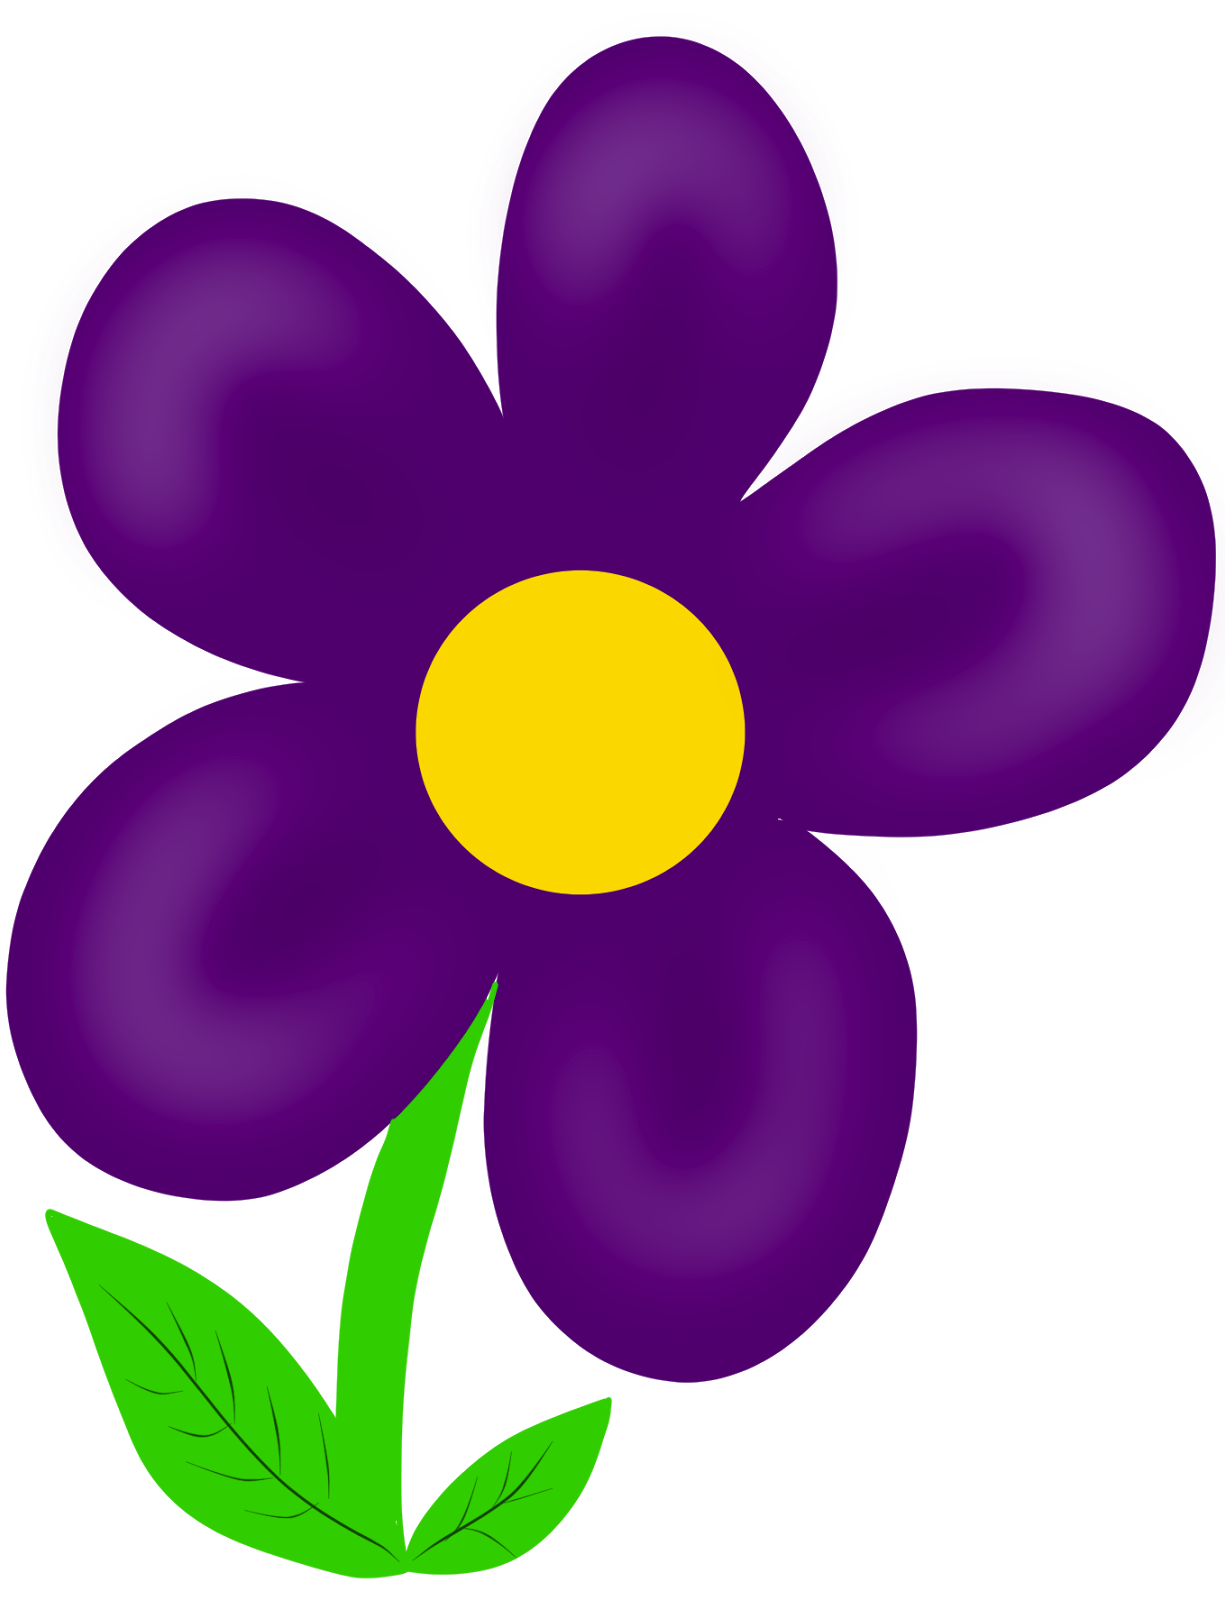 Summer Flowers Clip Art - Clipart library